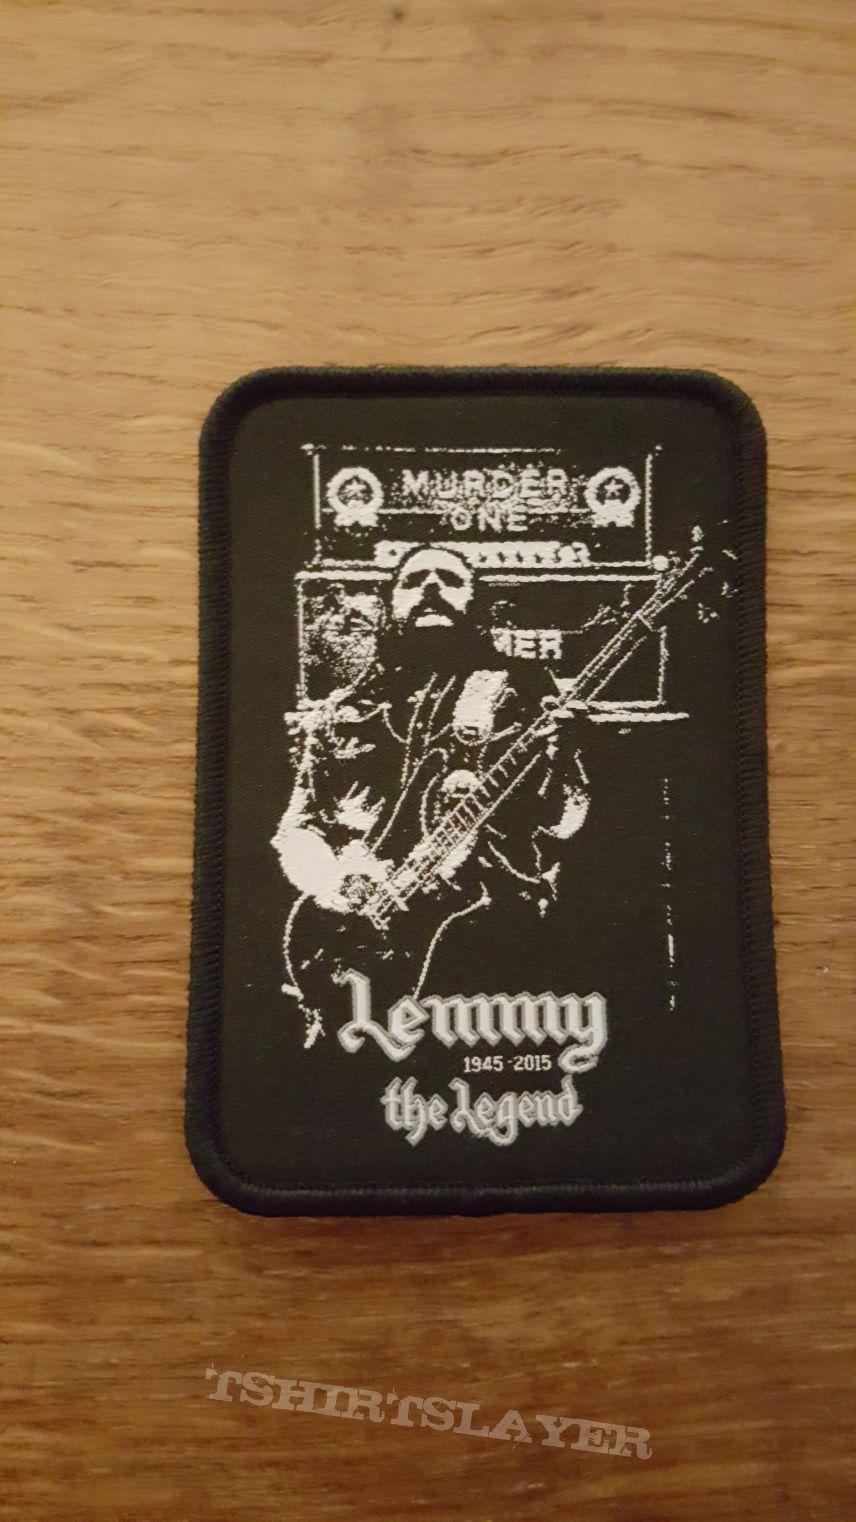 Lemmy the Legend patch black border